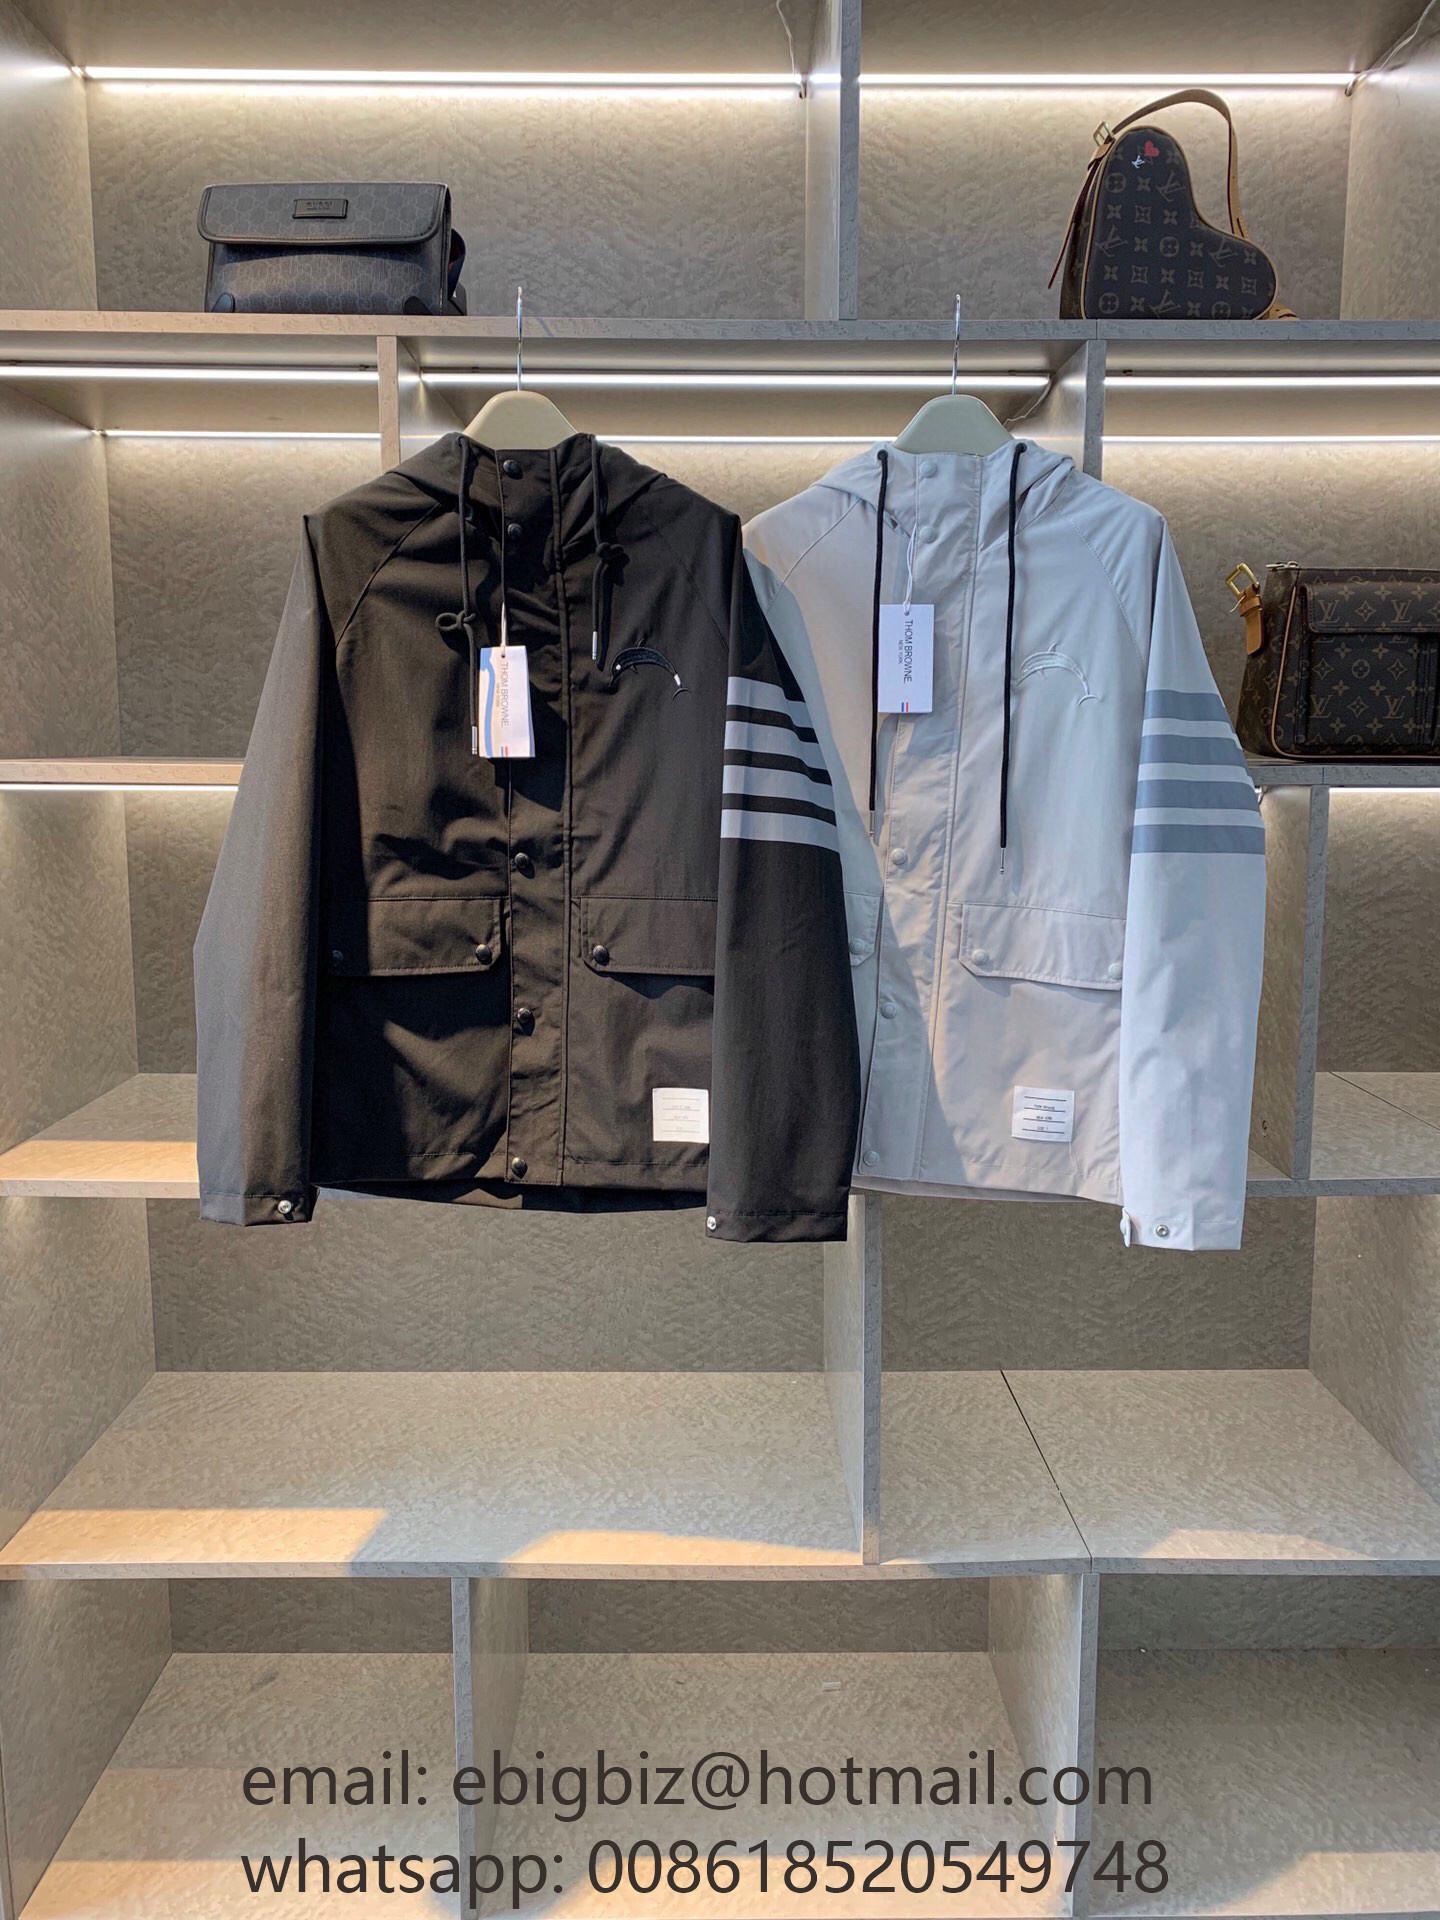 Cheap Thom Browne men's Jackets men's Thom Browne Jakcets Thom Browne men coats 8